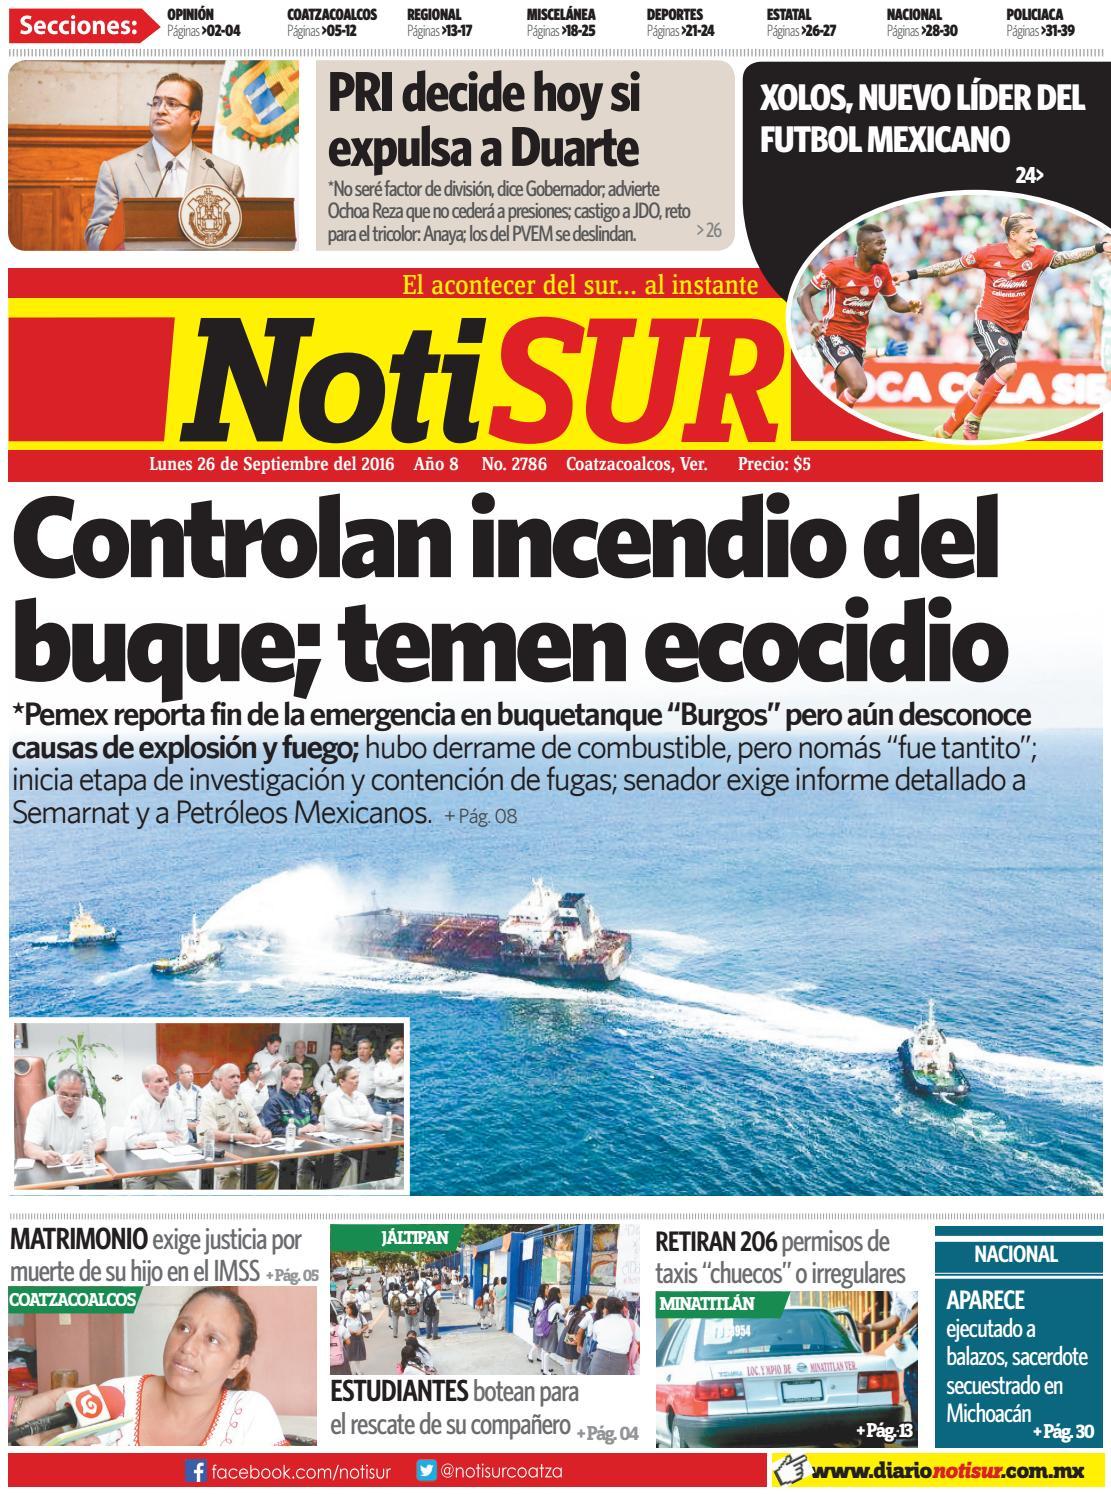 Notisur 26 De Septiembre 2016 By Diario Notisur Coatzacoalcos 2015